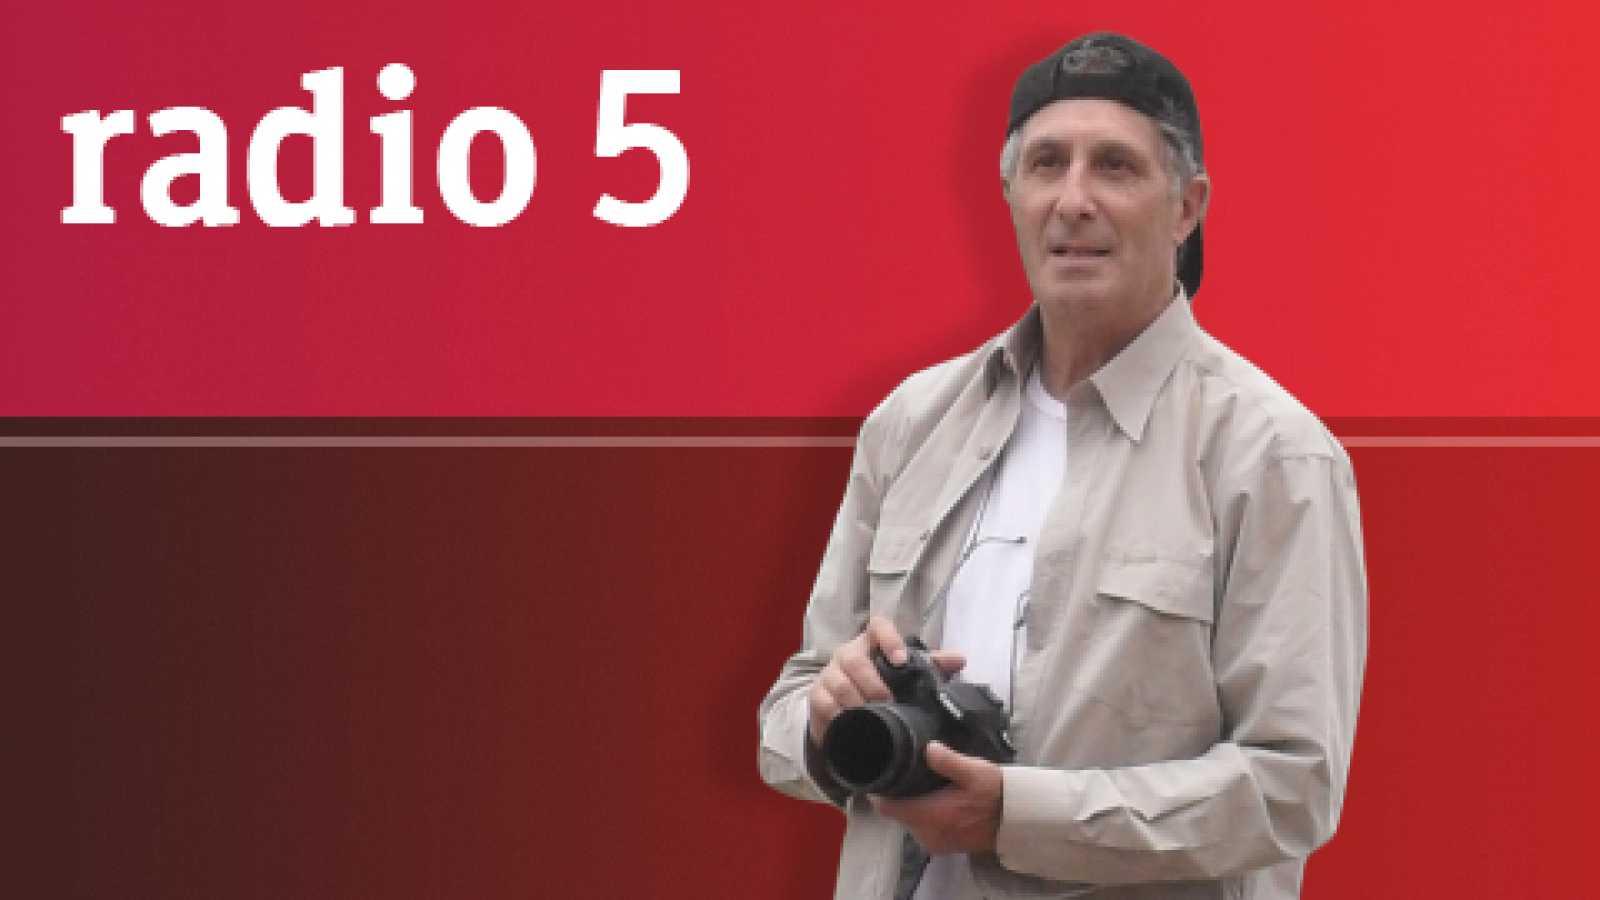 Crónicas de un nómada - Vivir como un troglodita en Guadix - 26/05/19 - escuchar ahora